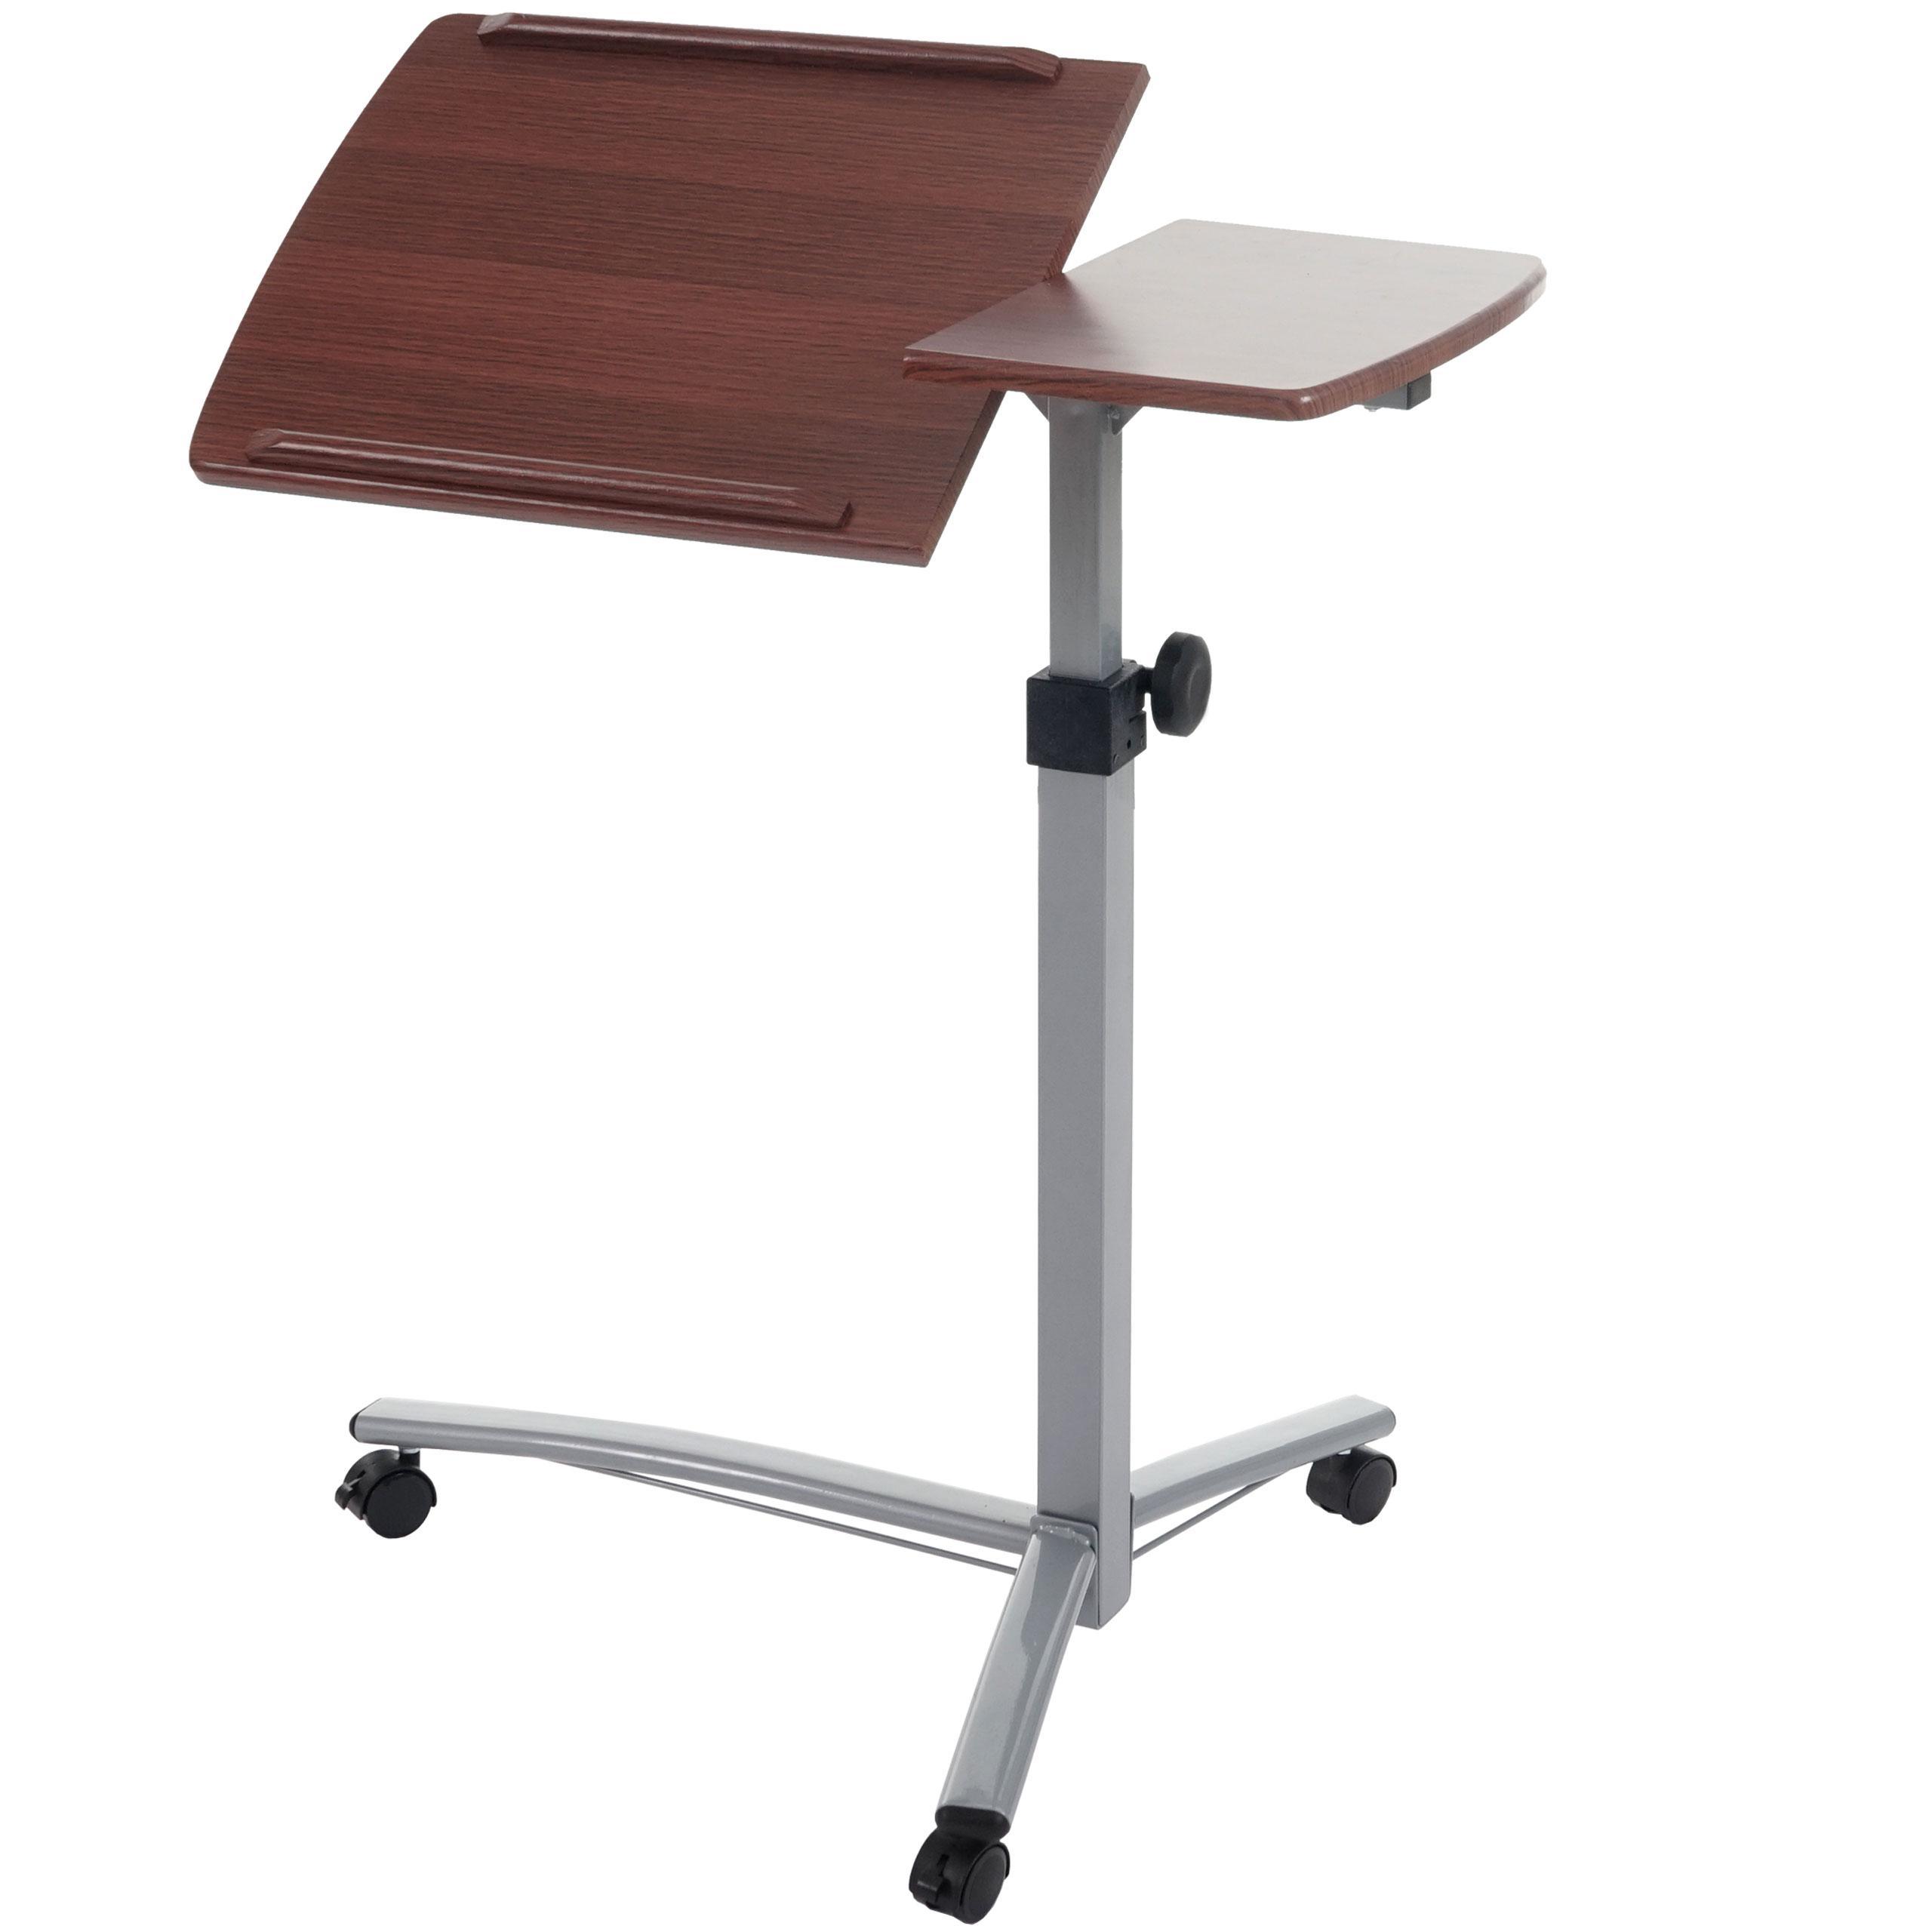 Mesa atril stand superficie para ordenador y rat n - Mesa para ordenador portatil ...